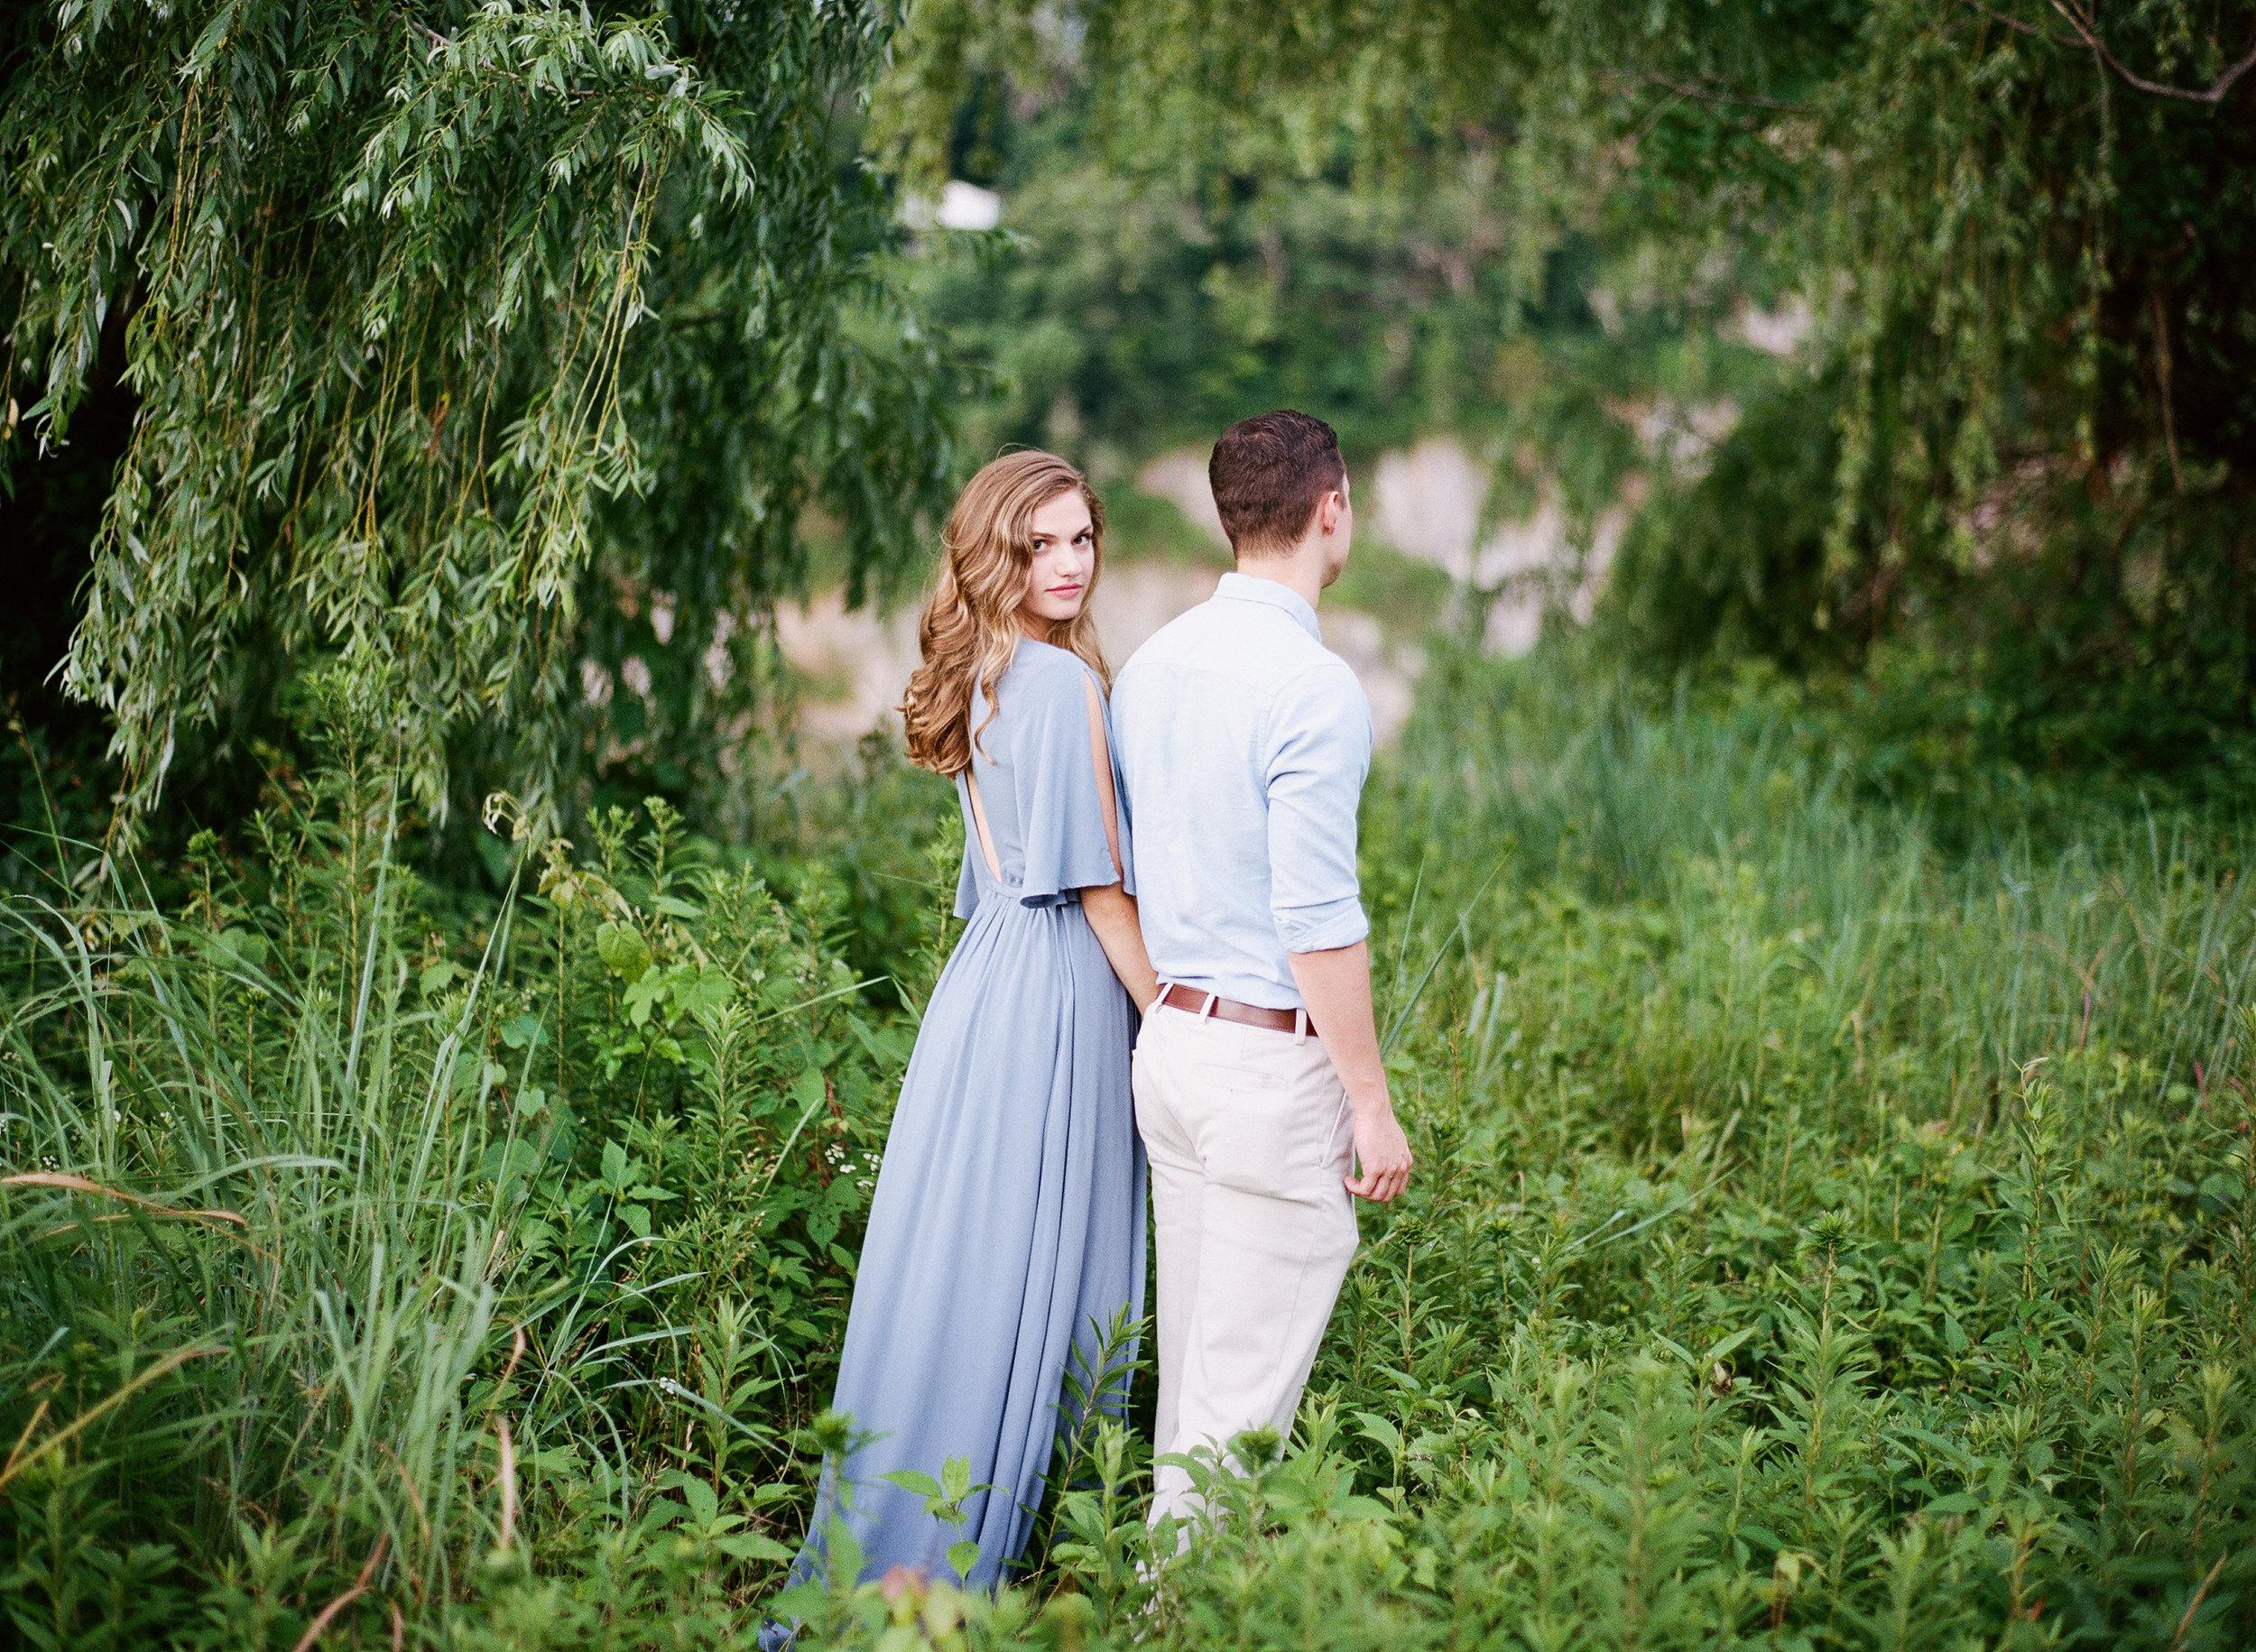 Rachel_Brandon_Engagement_Photos_Knoxville_Abigail_Malone_Phography-105.jpg